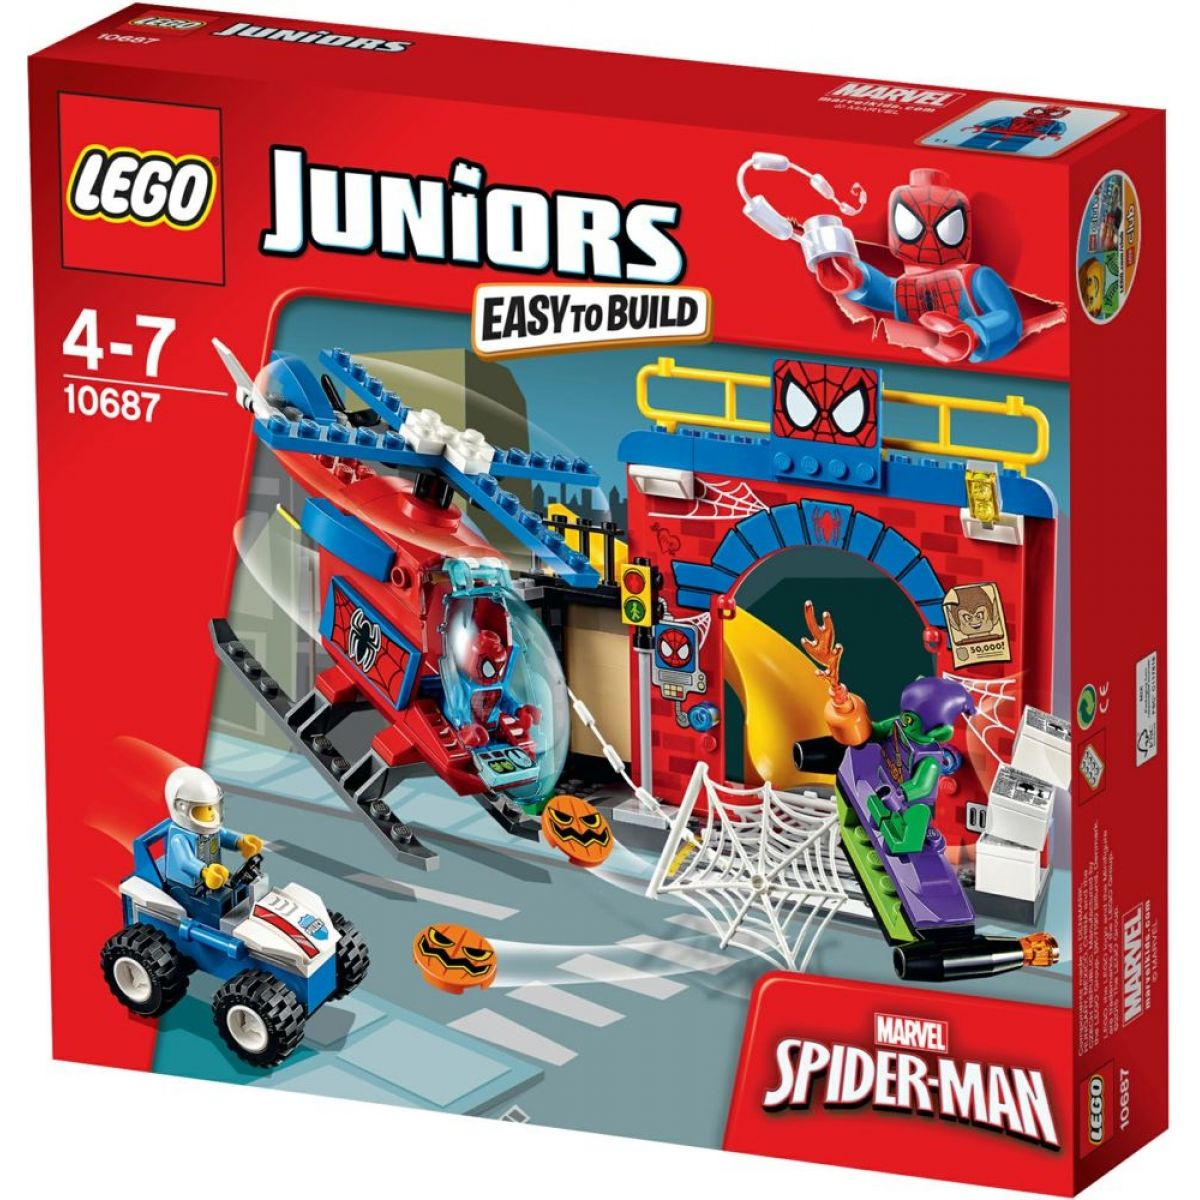 LEGO Juniors 10687 Spidermanova skrýš